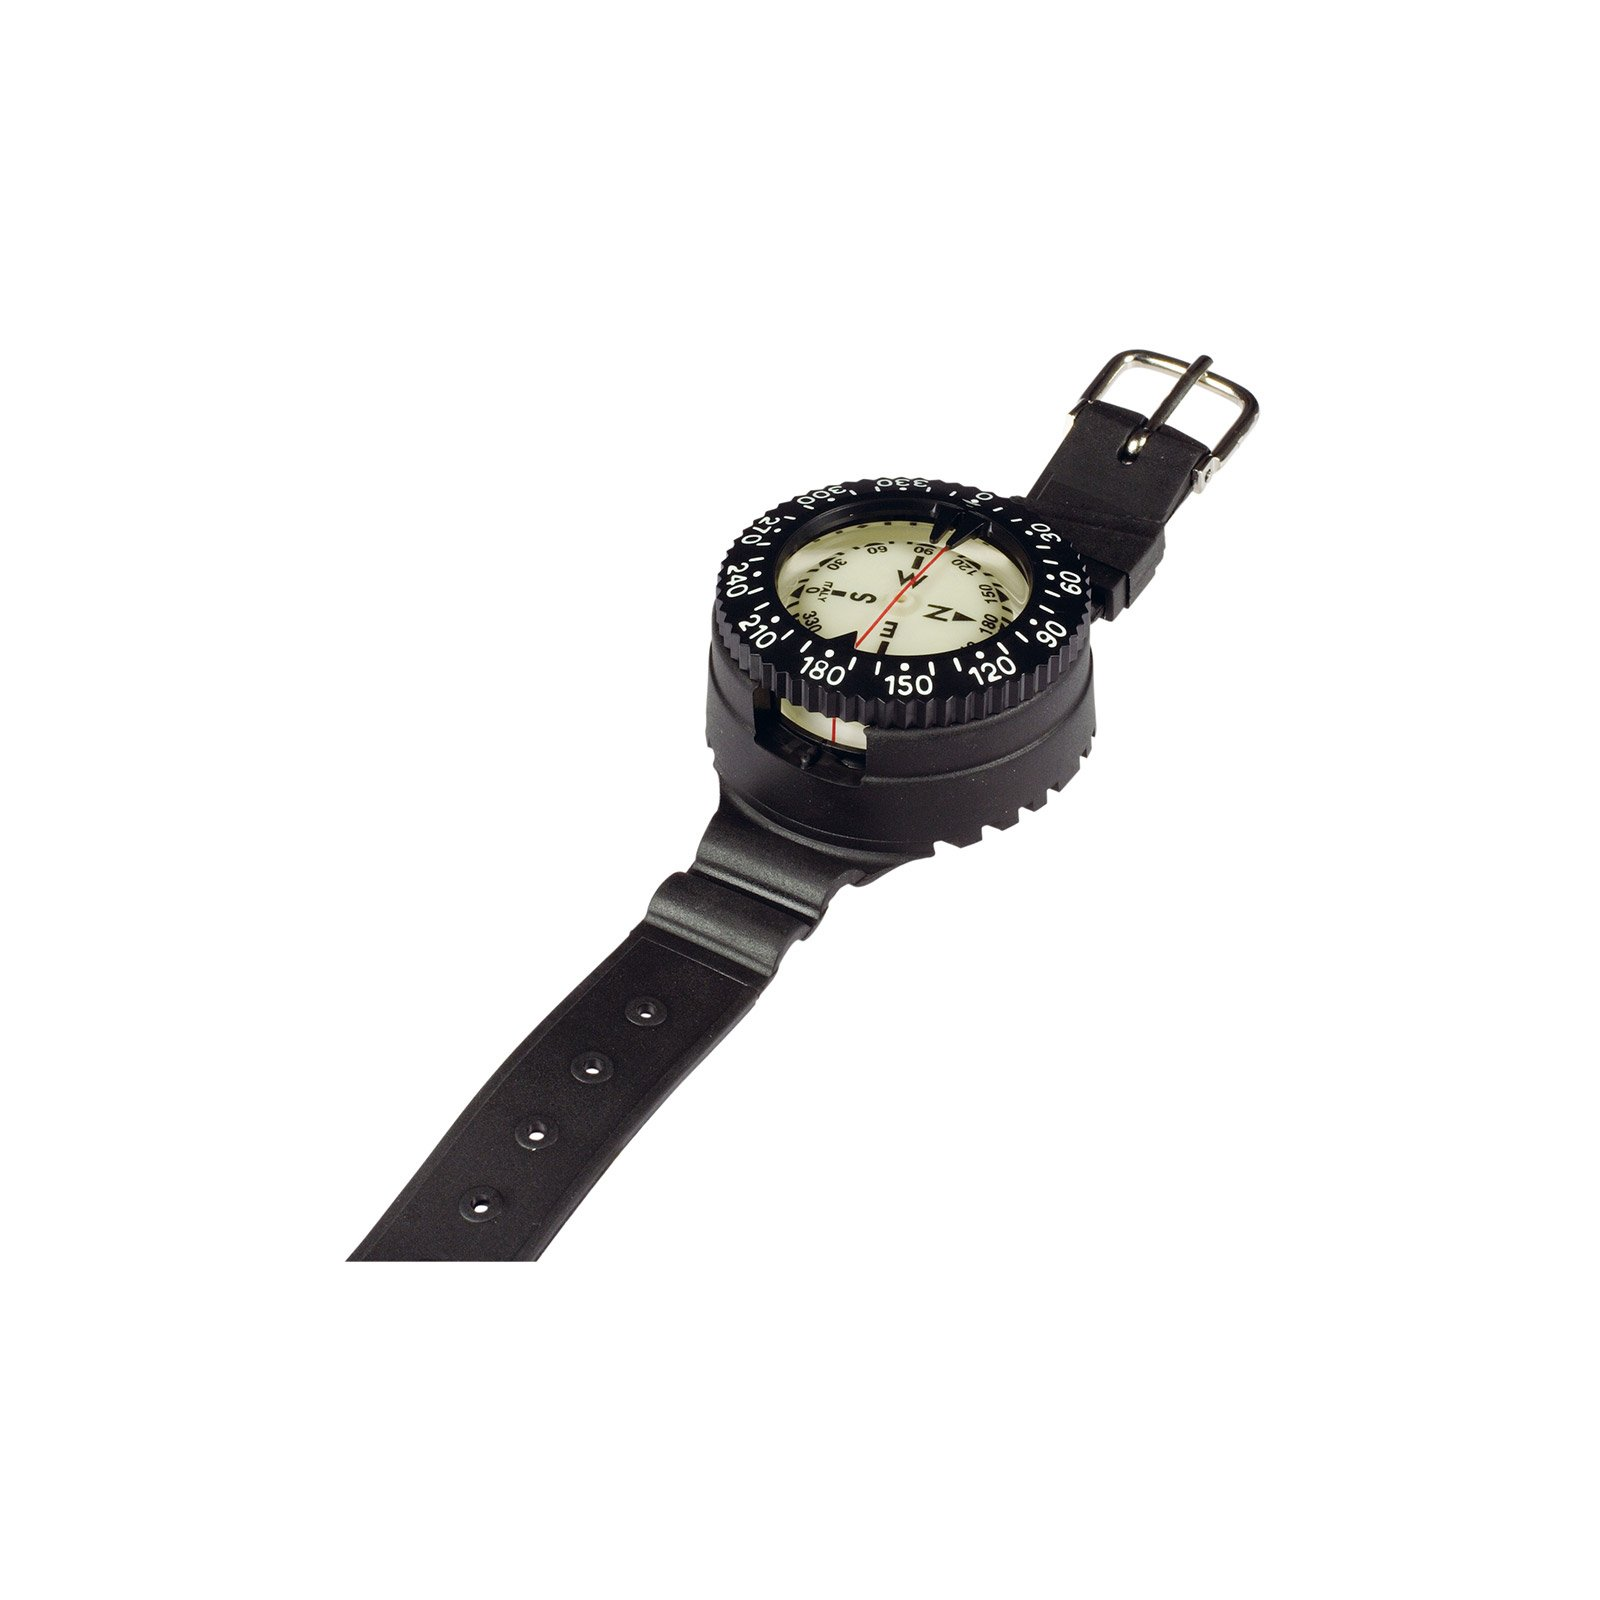 Mares Mission 1C - Wrist Compass